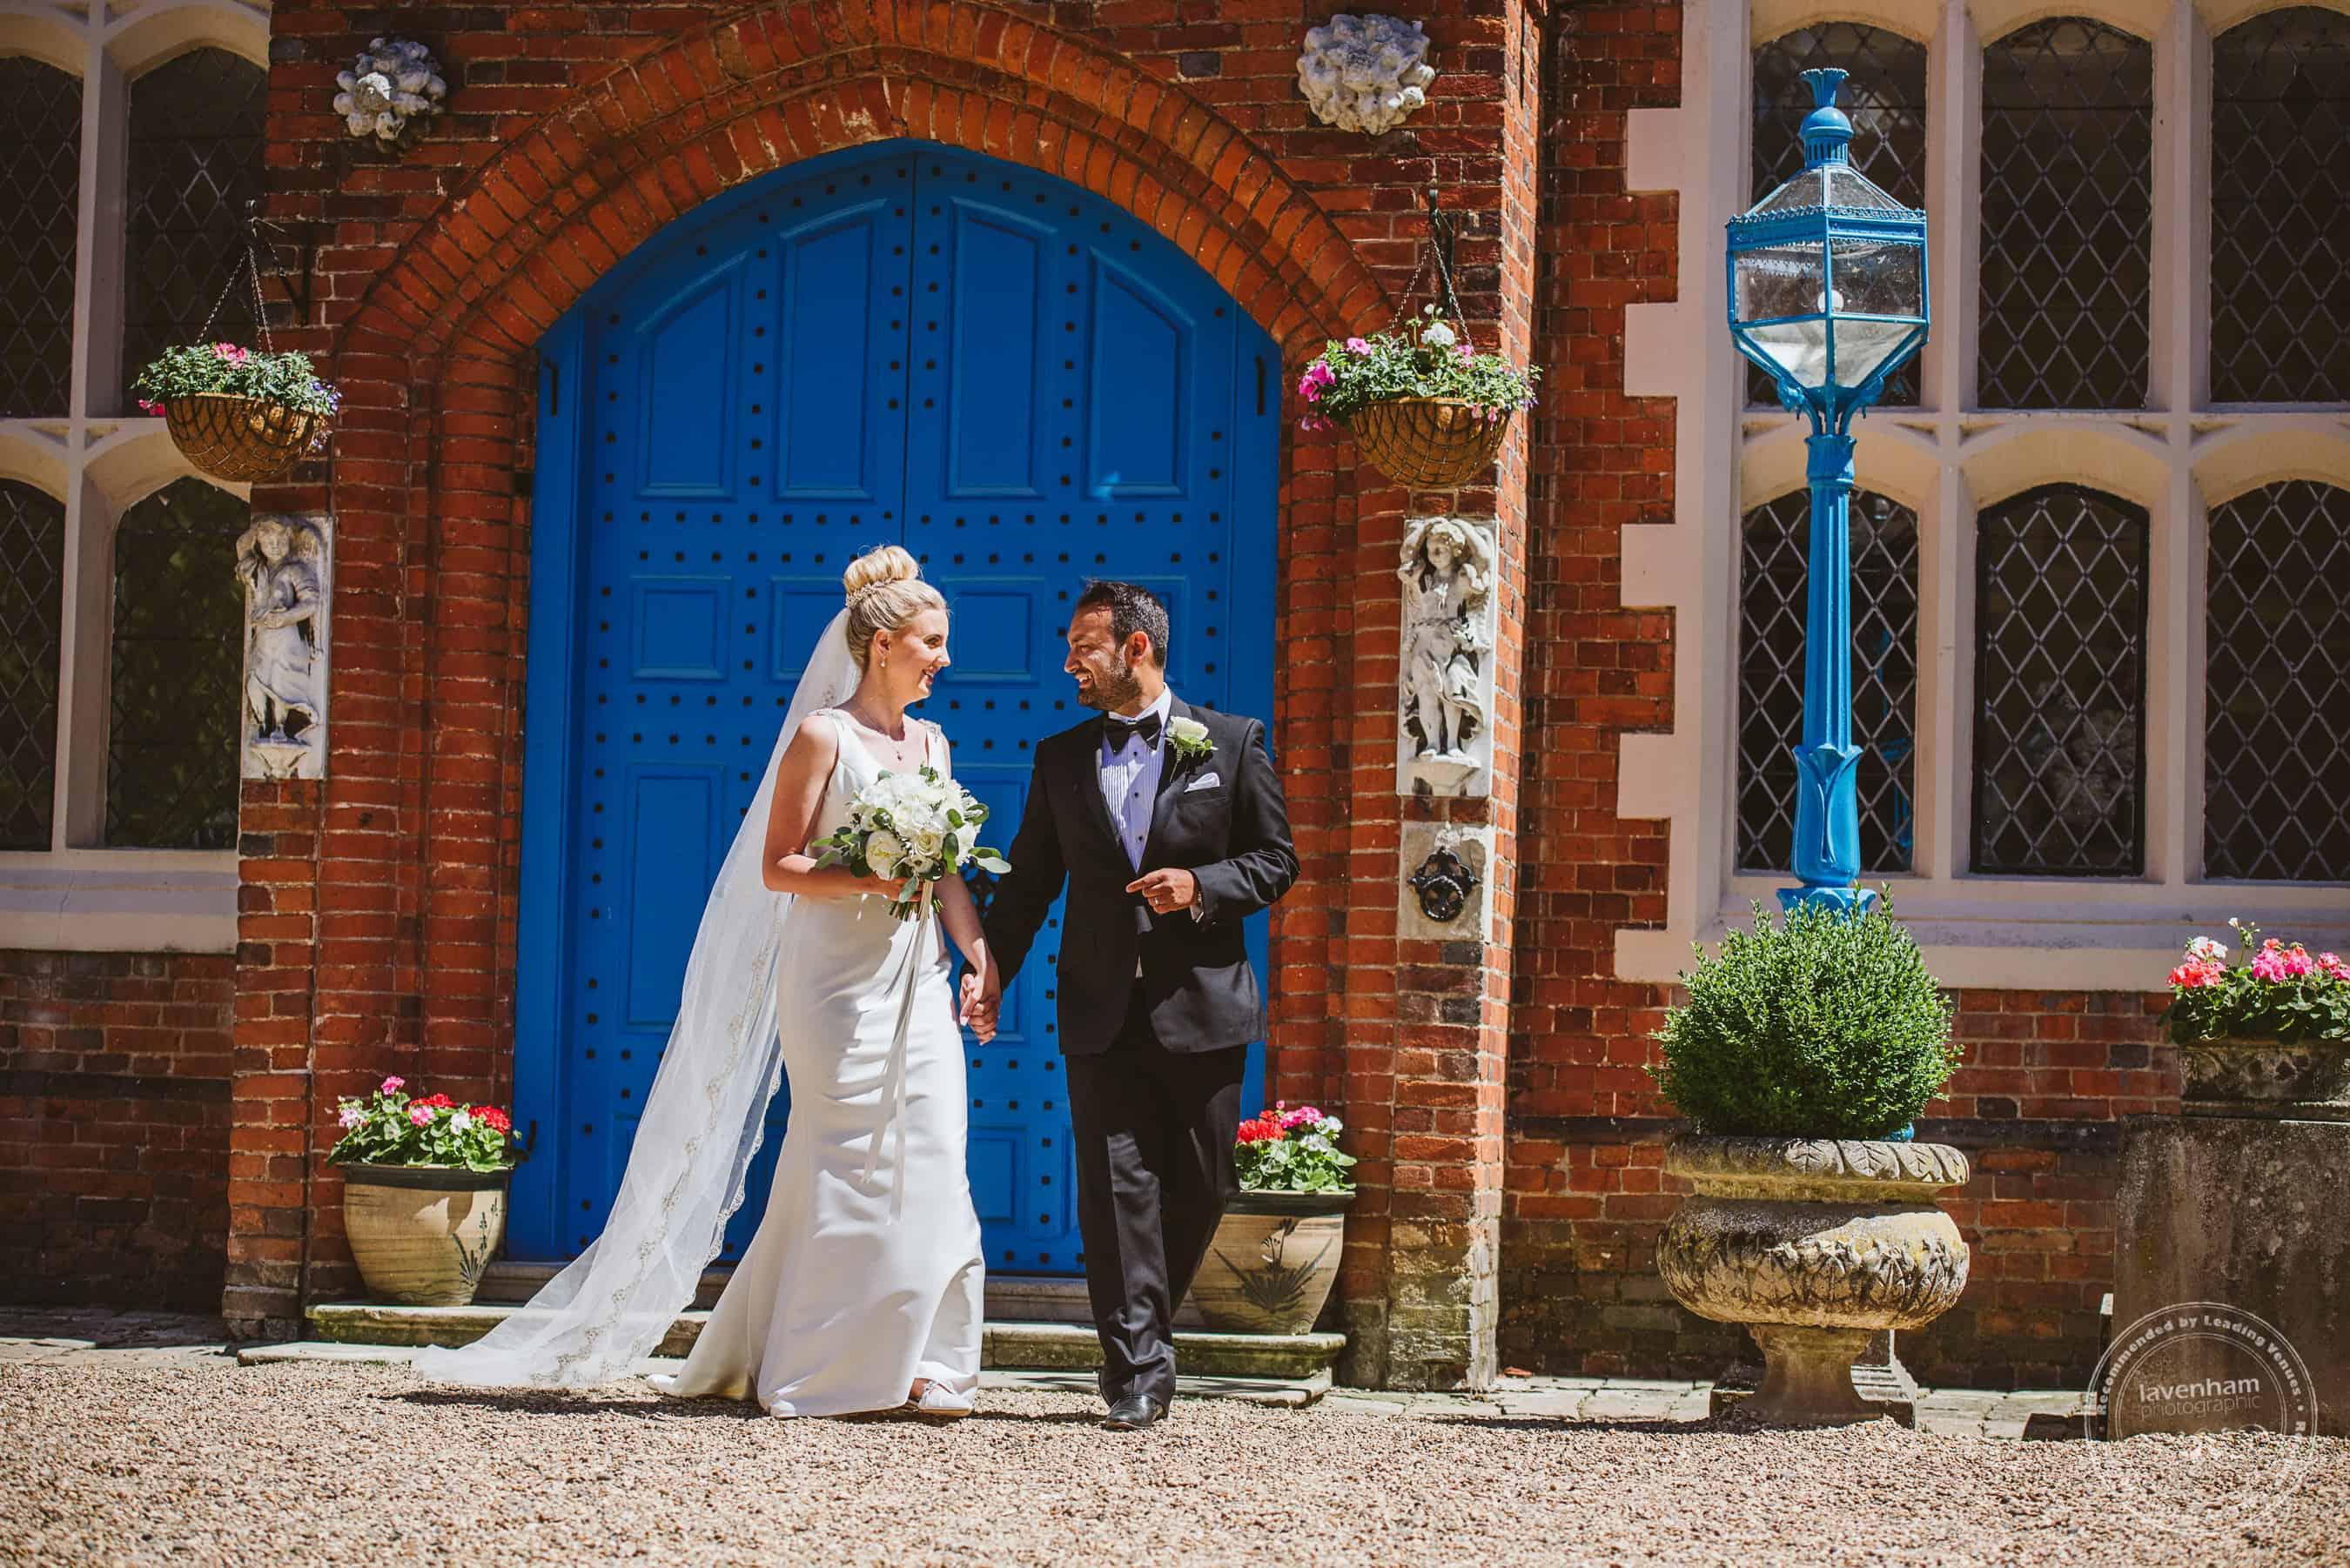 220618 Gosfield Hall Wedding Photography Lavenham Photographic 0104